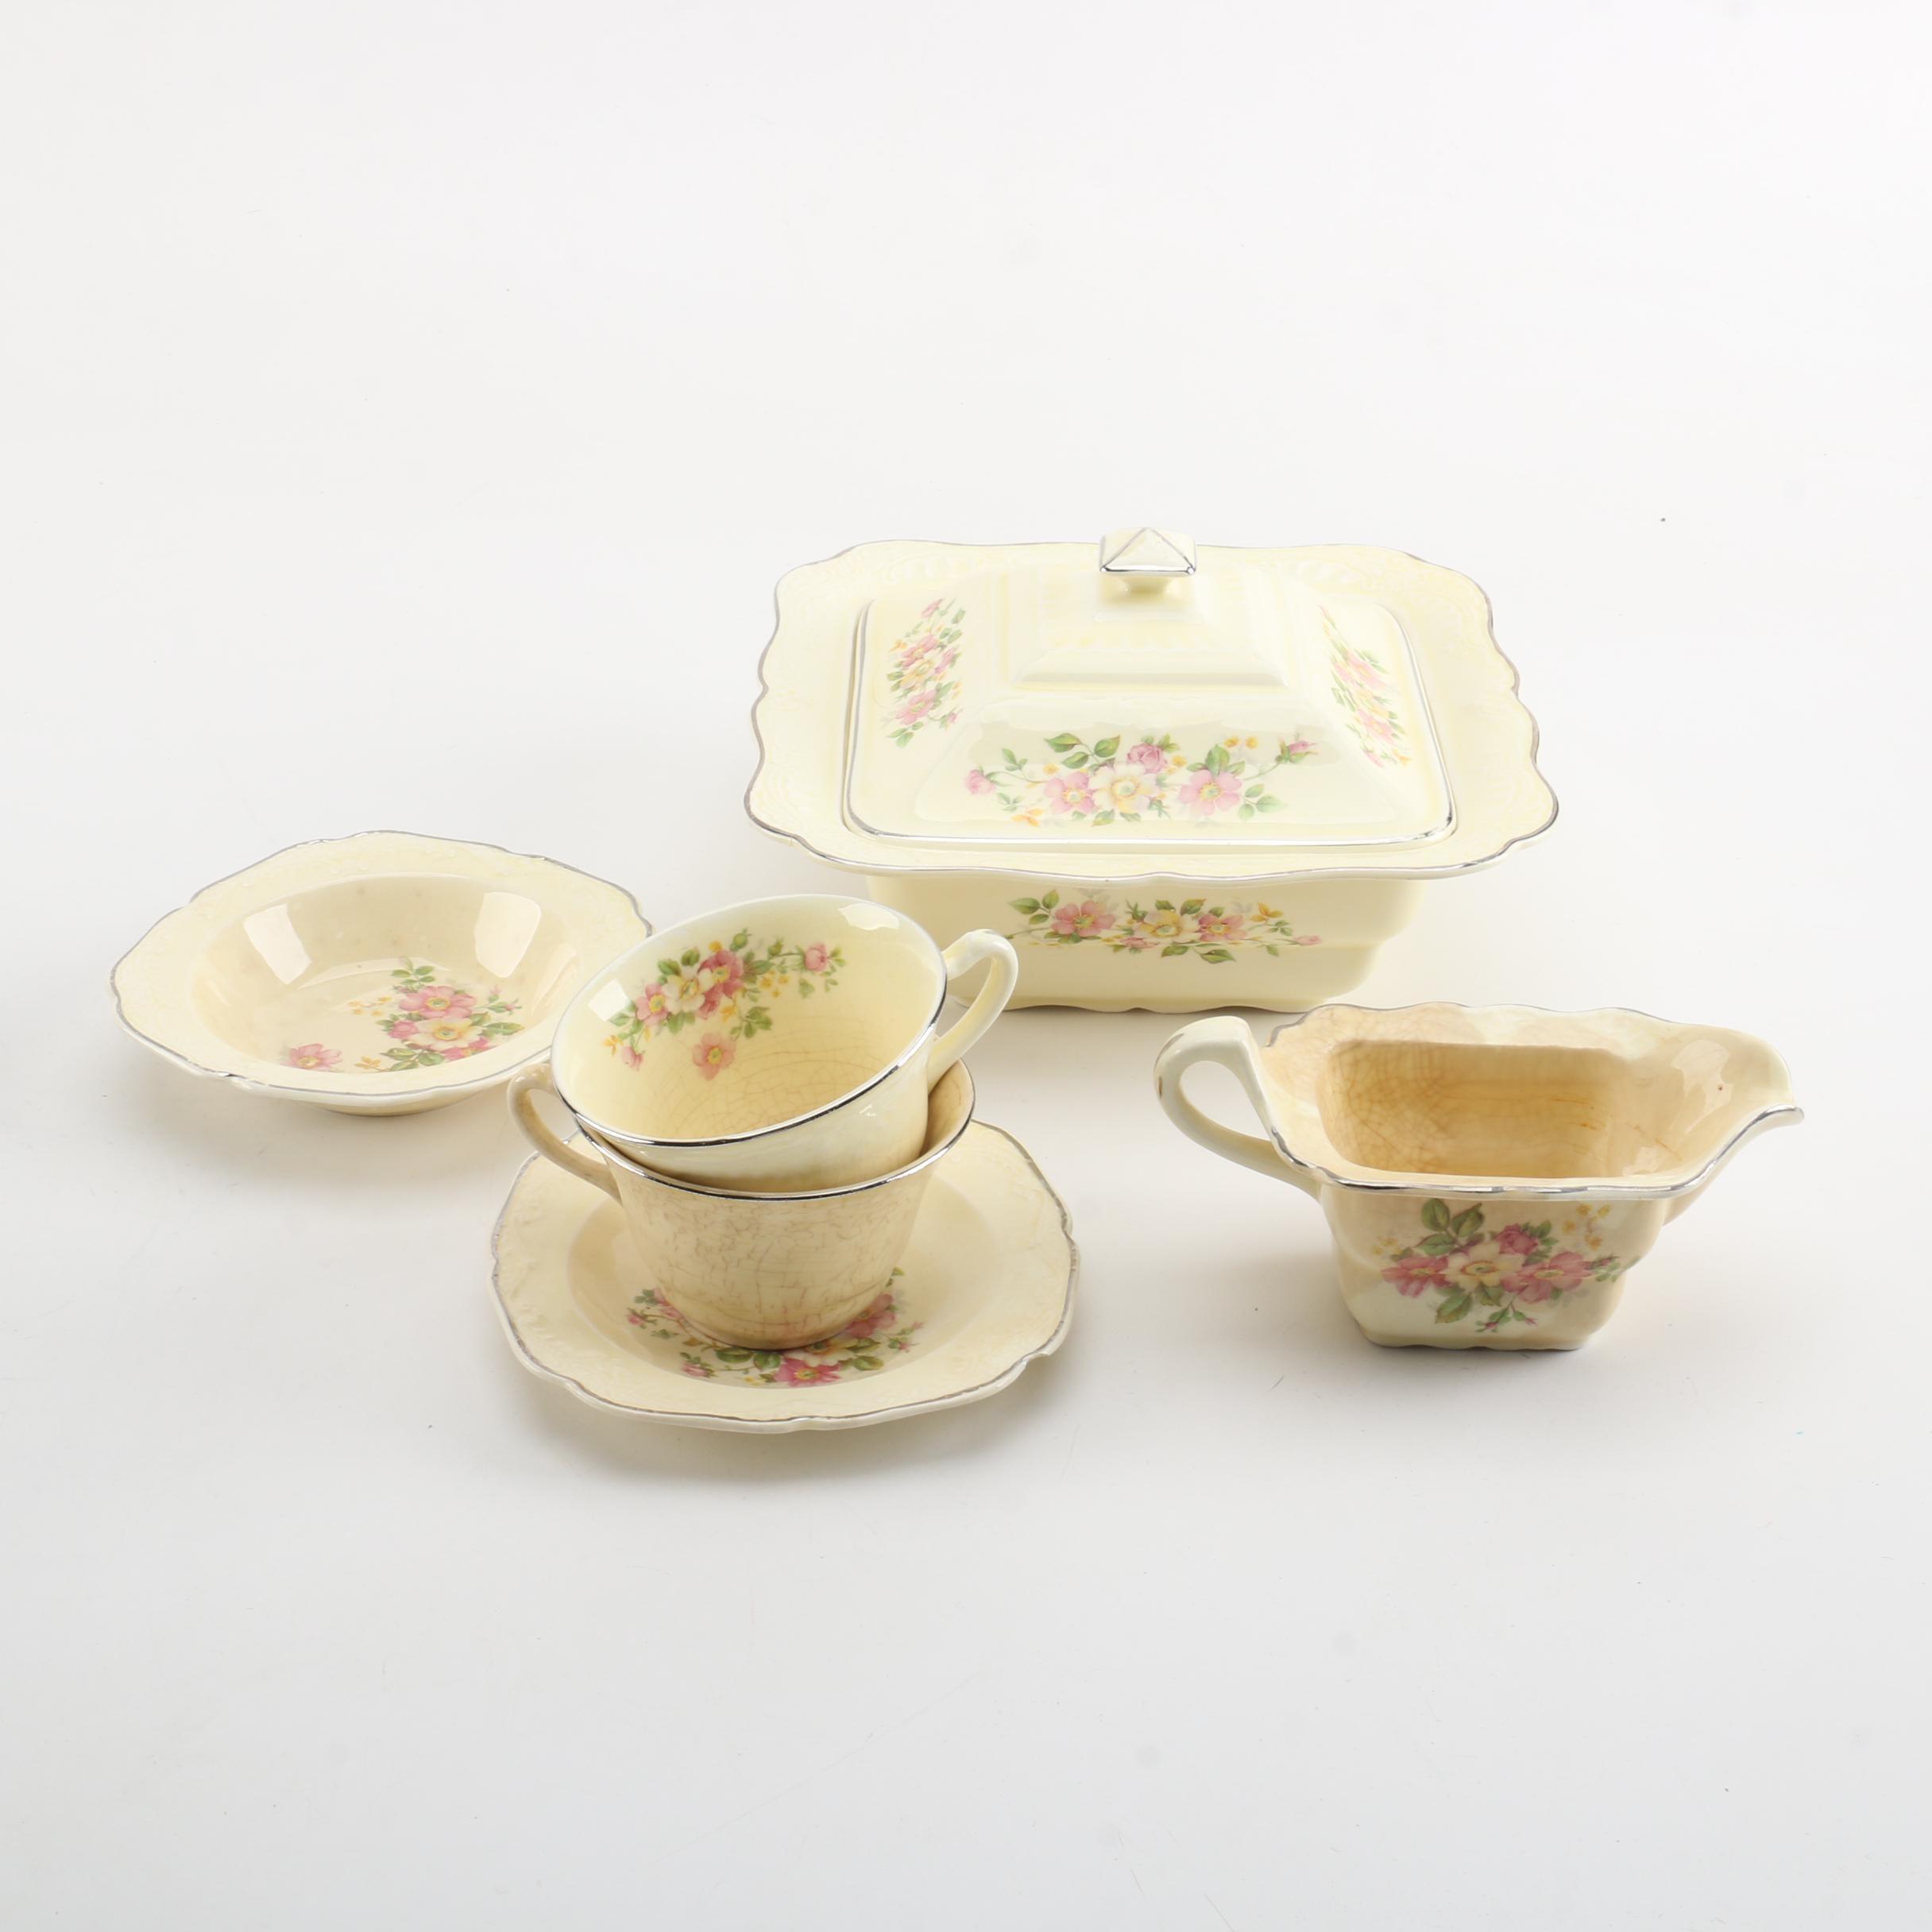 1930s Paden City Pottery Ironstone Serveware